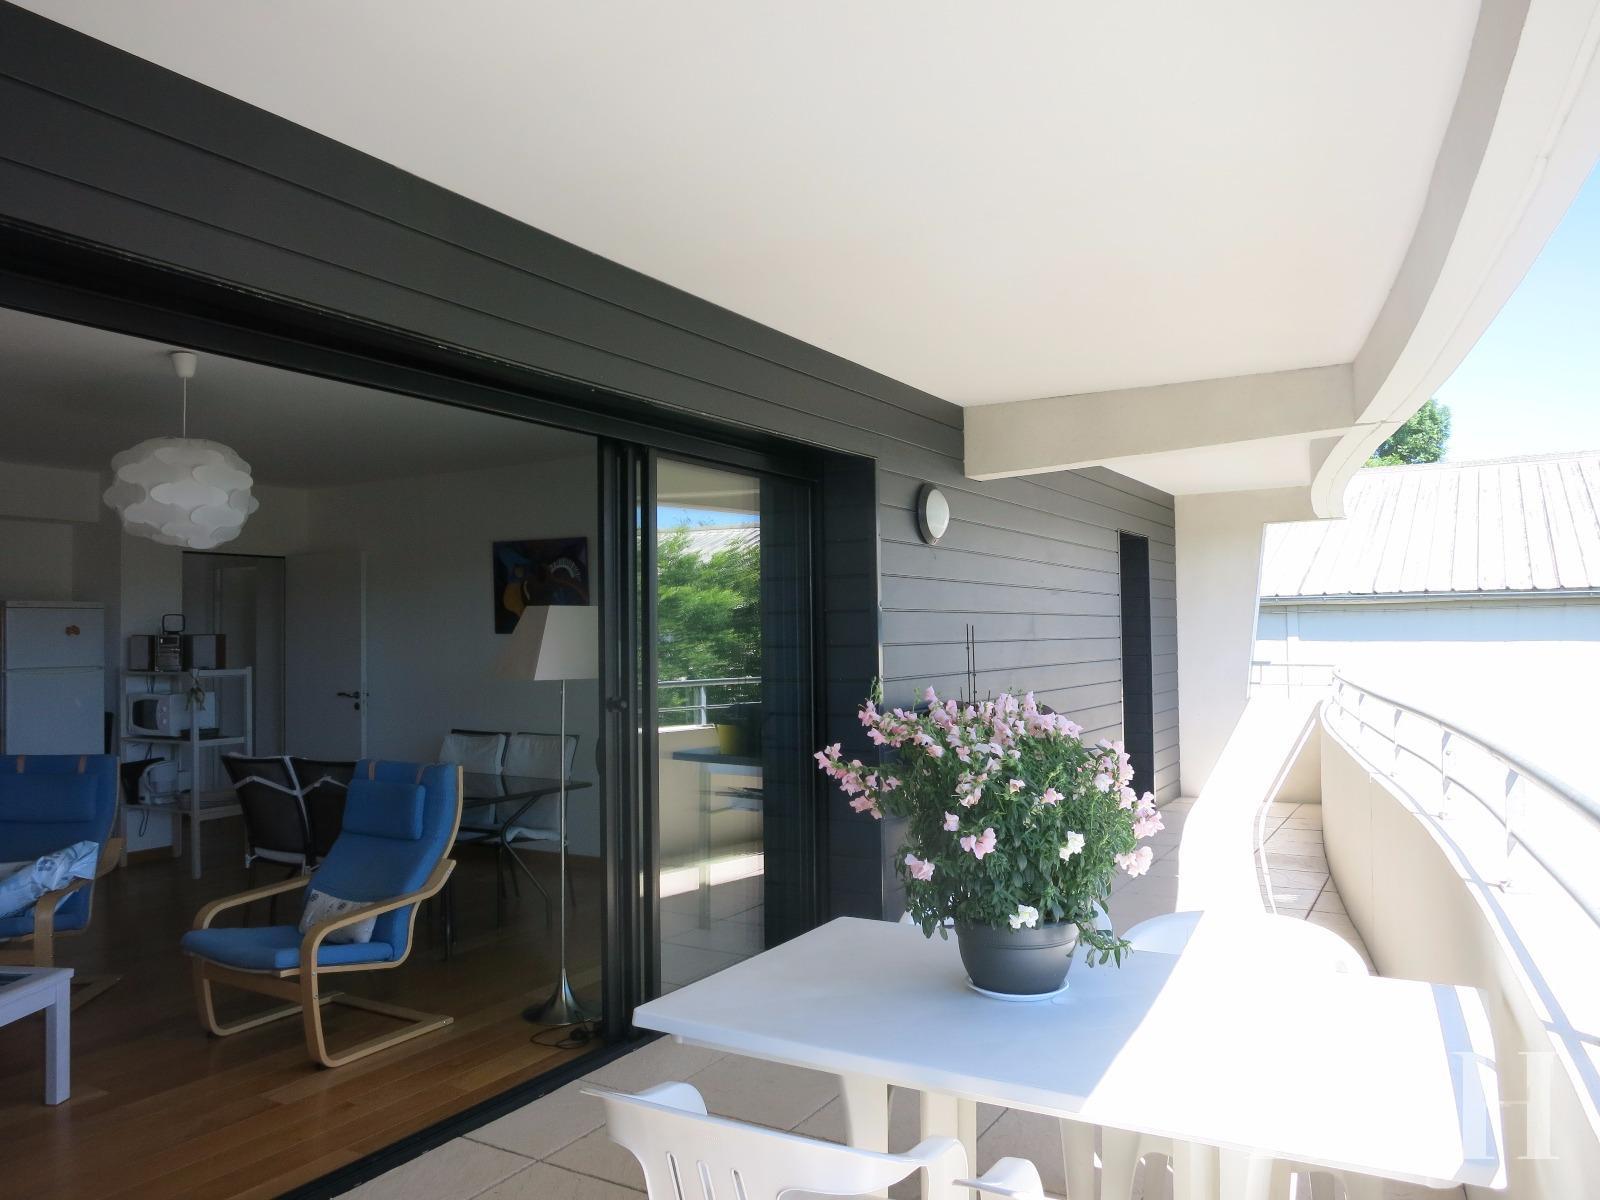 Vente appartement la rochelle avec home sweet home immobilier for Garage ad la rochelle